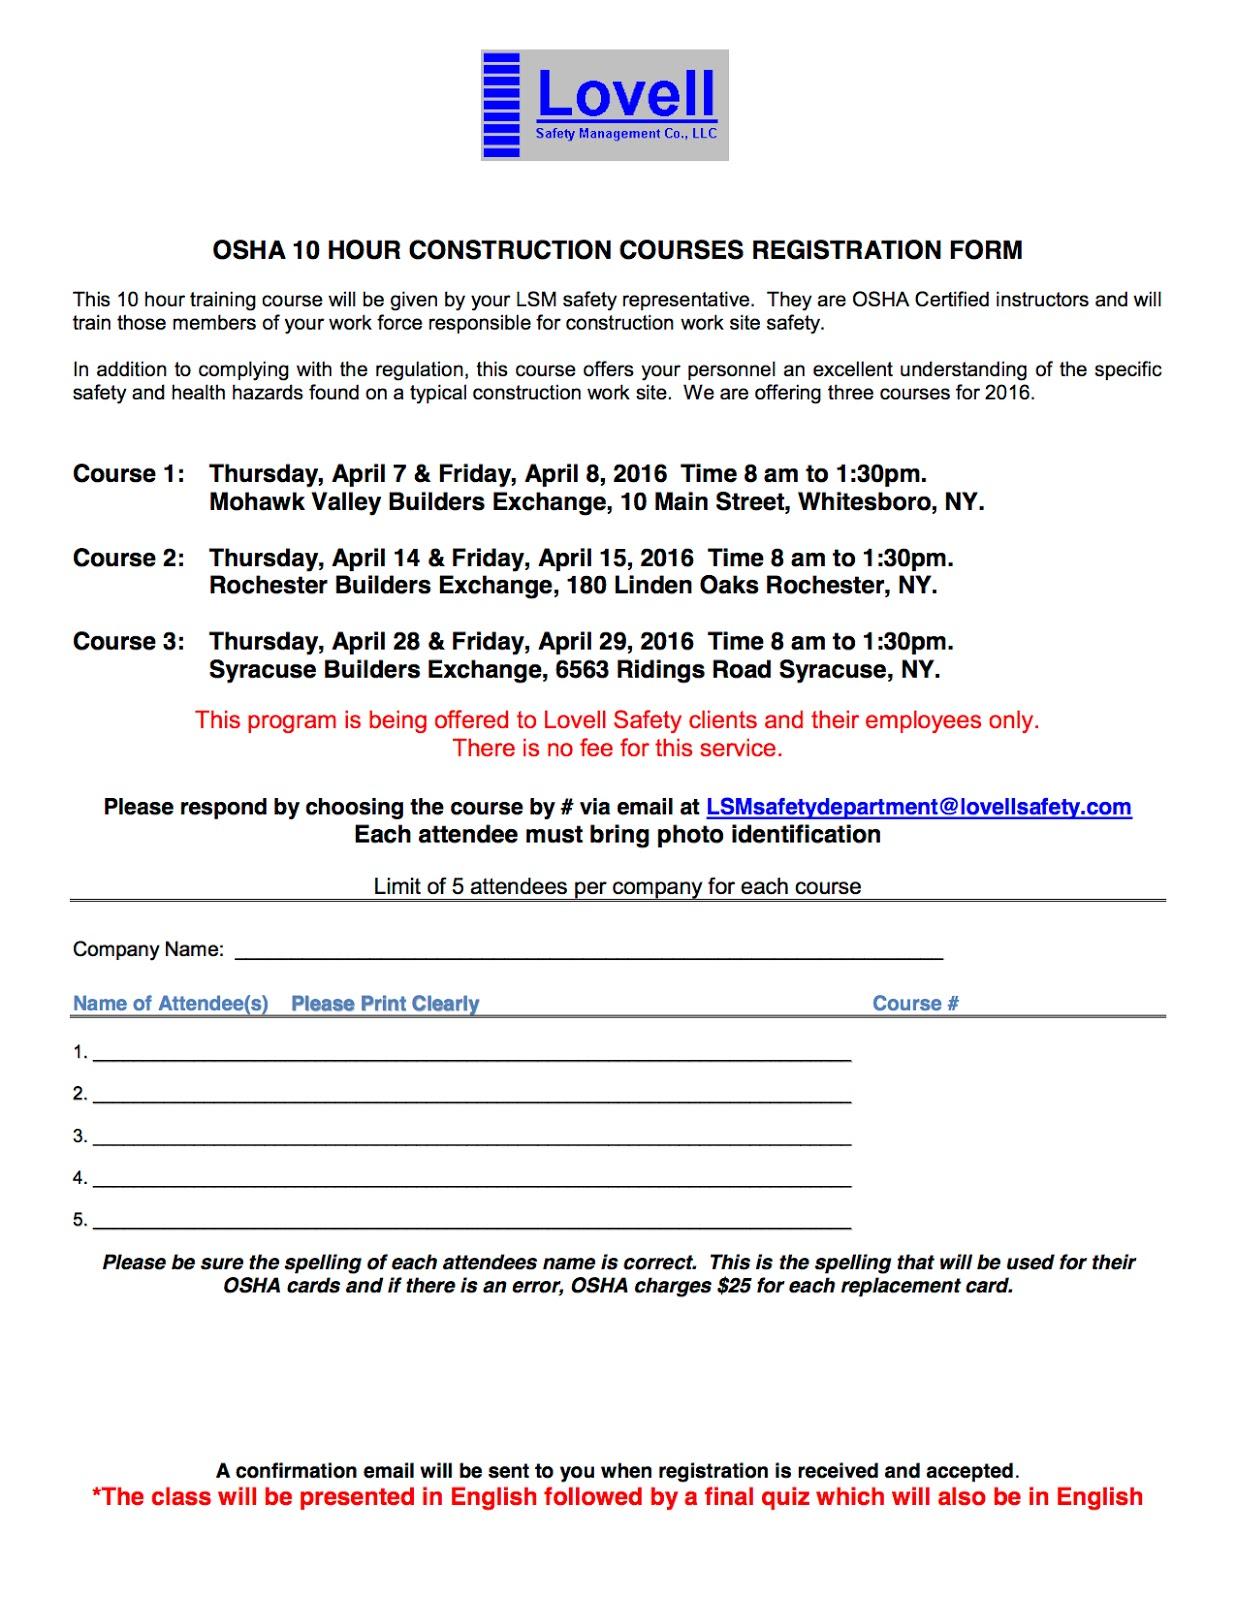 Safety Pays Osha 10 Hour Construction Courses Registration Form